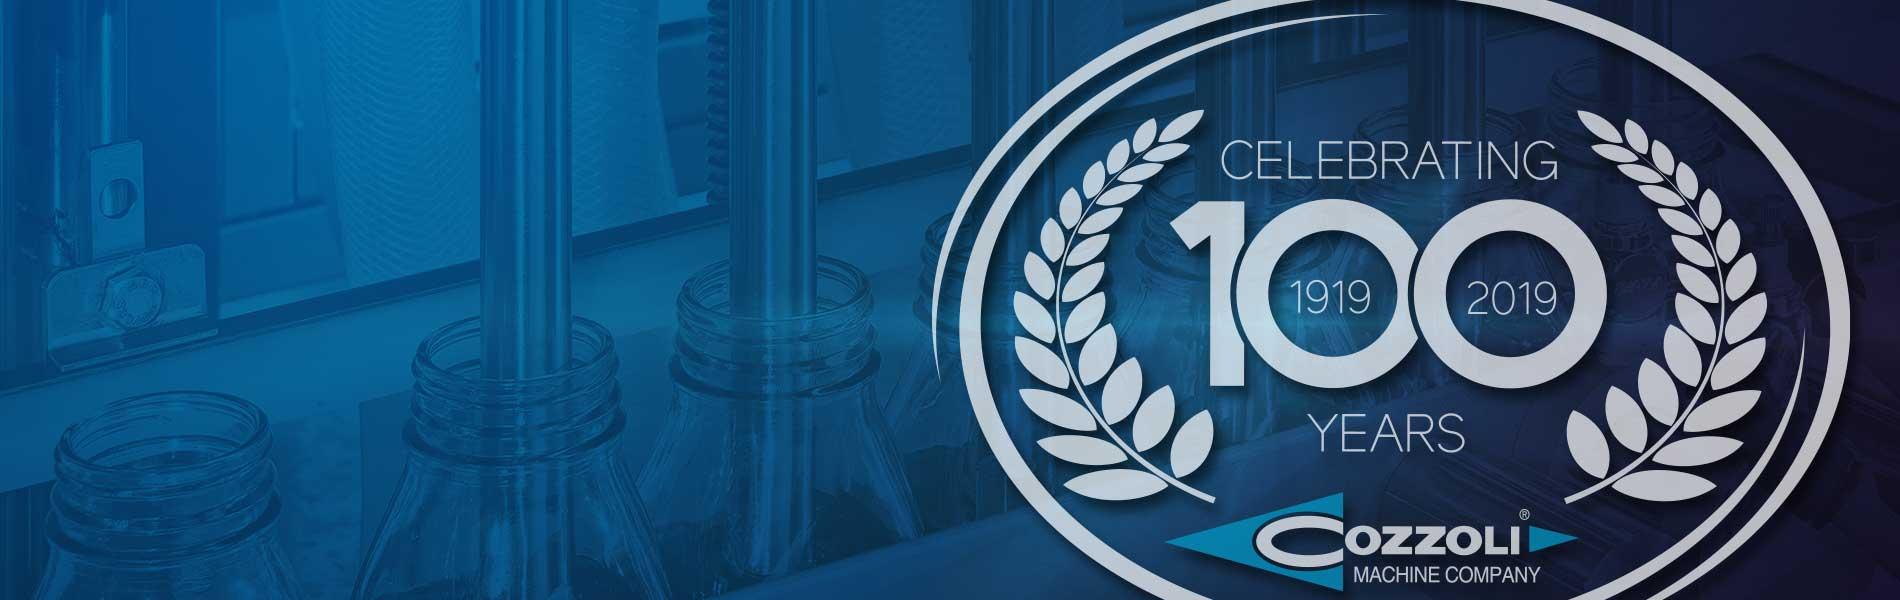 Cozzoli Machine Company 100 Year Anniversary